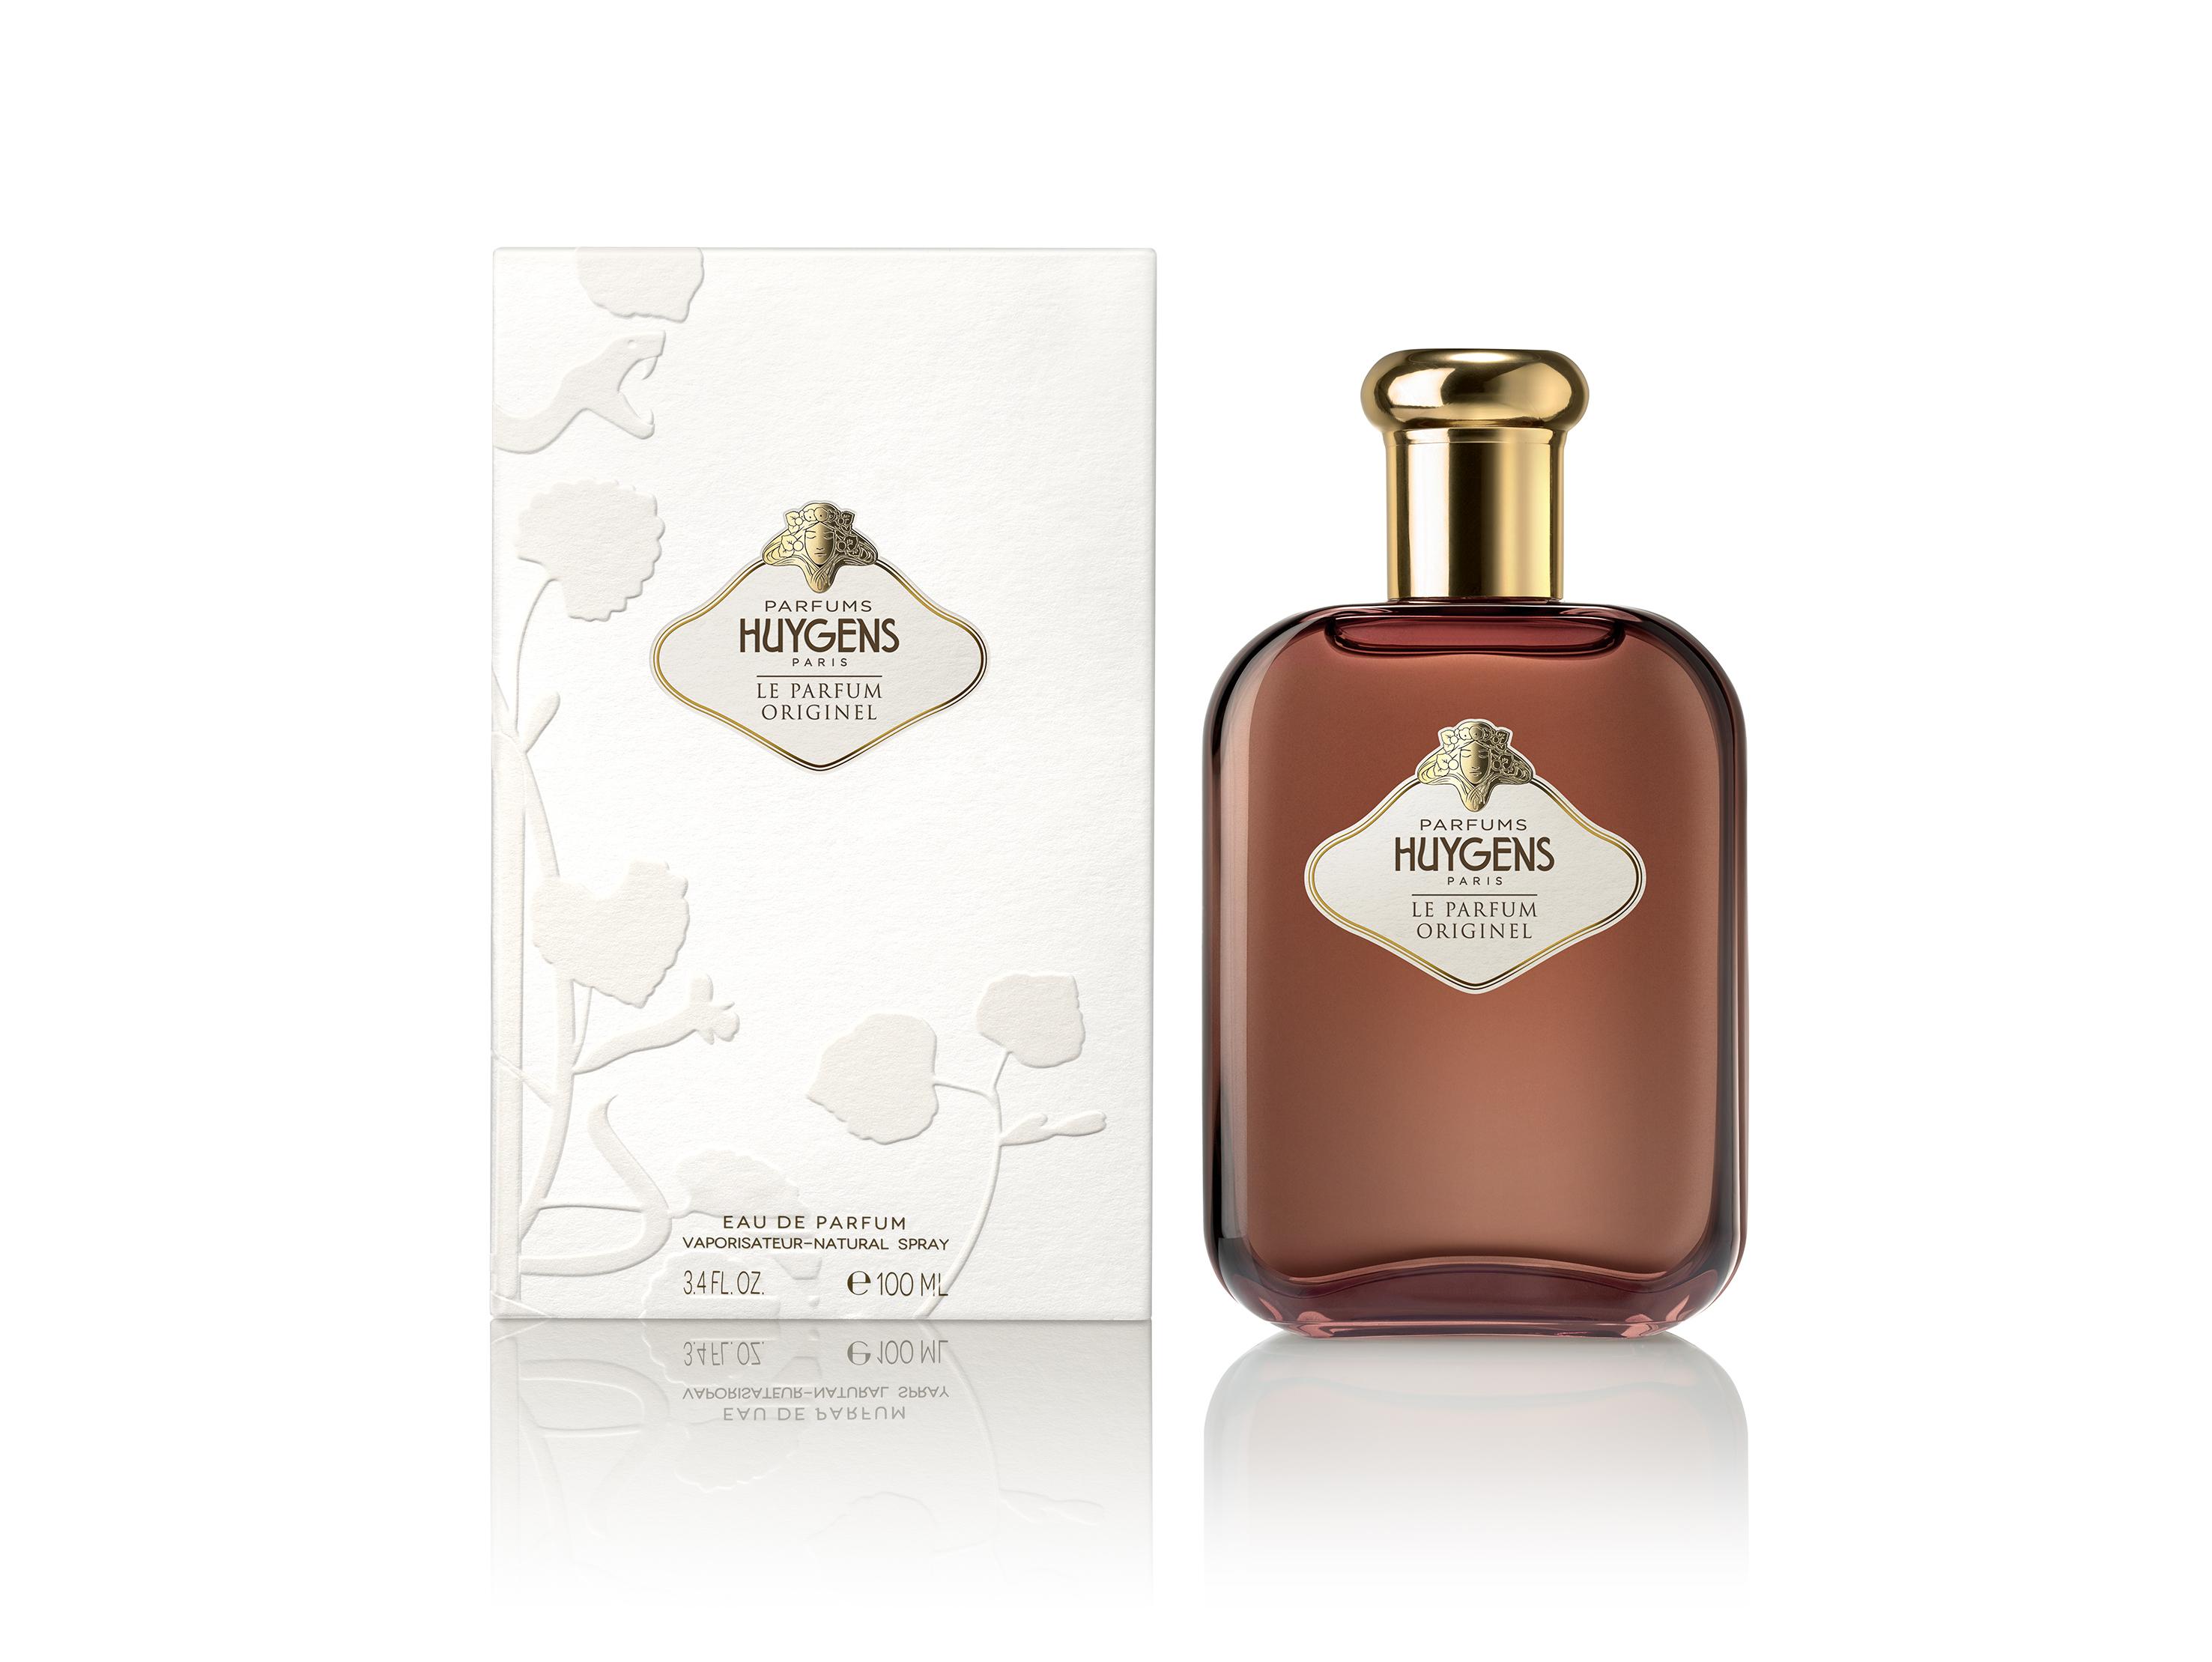 Discover the The Original Perfume Huygens